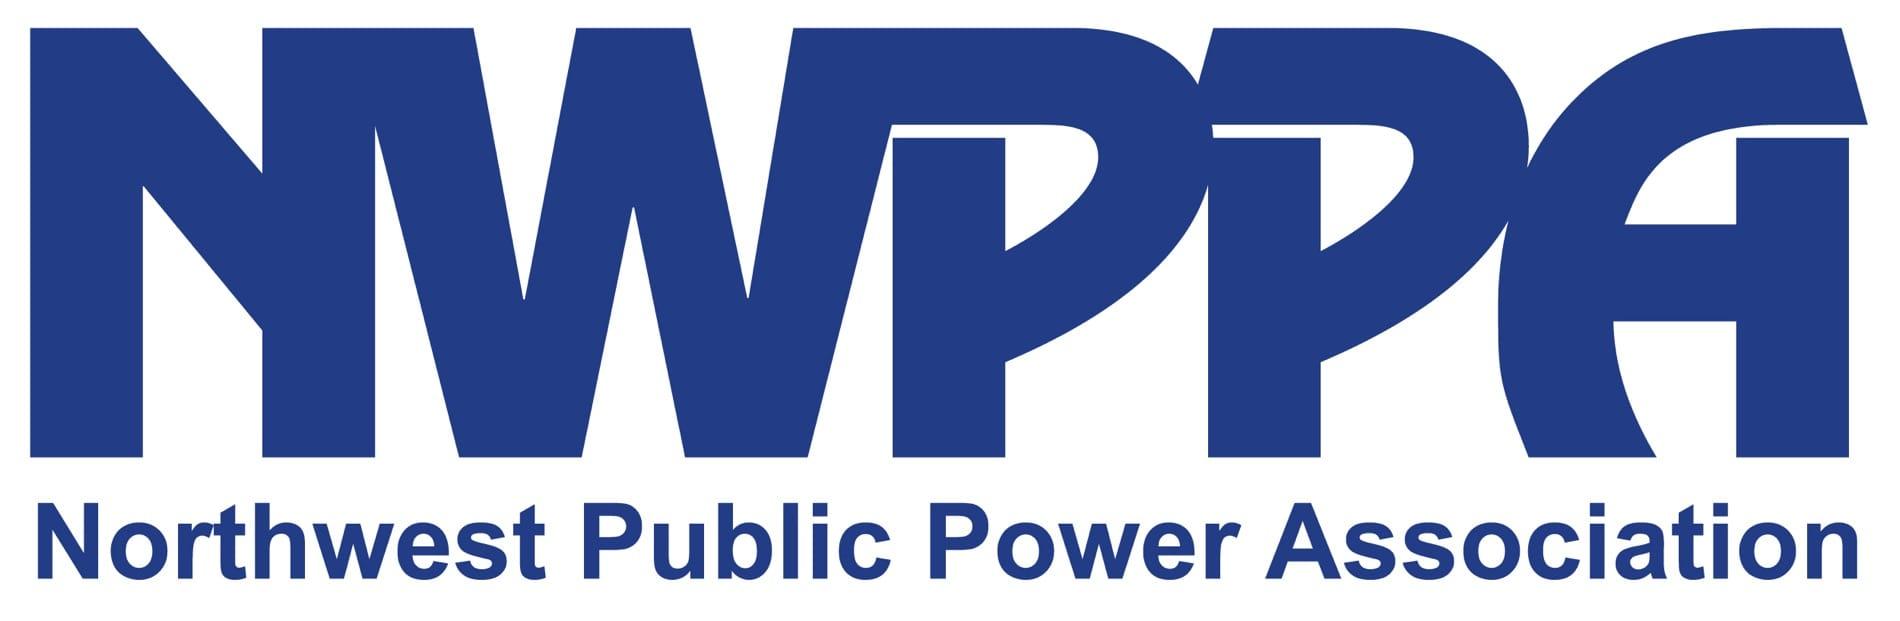 Northwest Public Power Association Logo